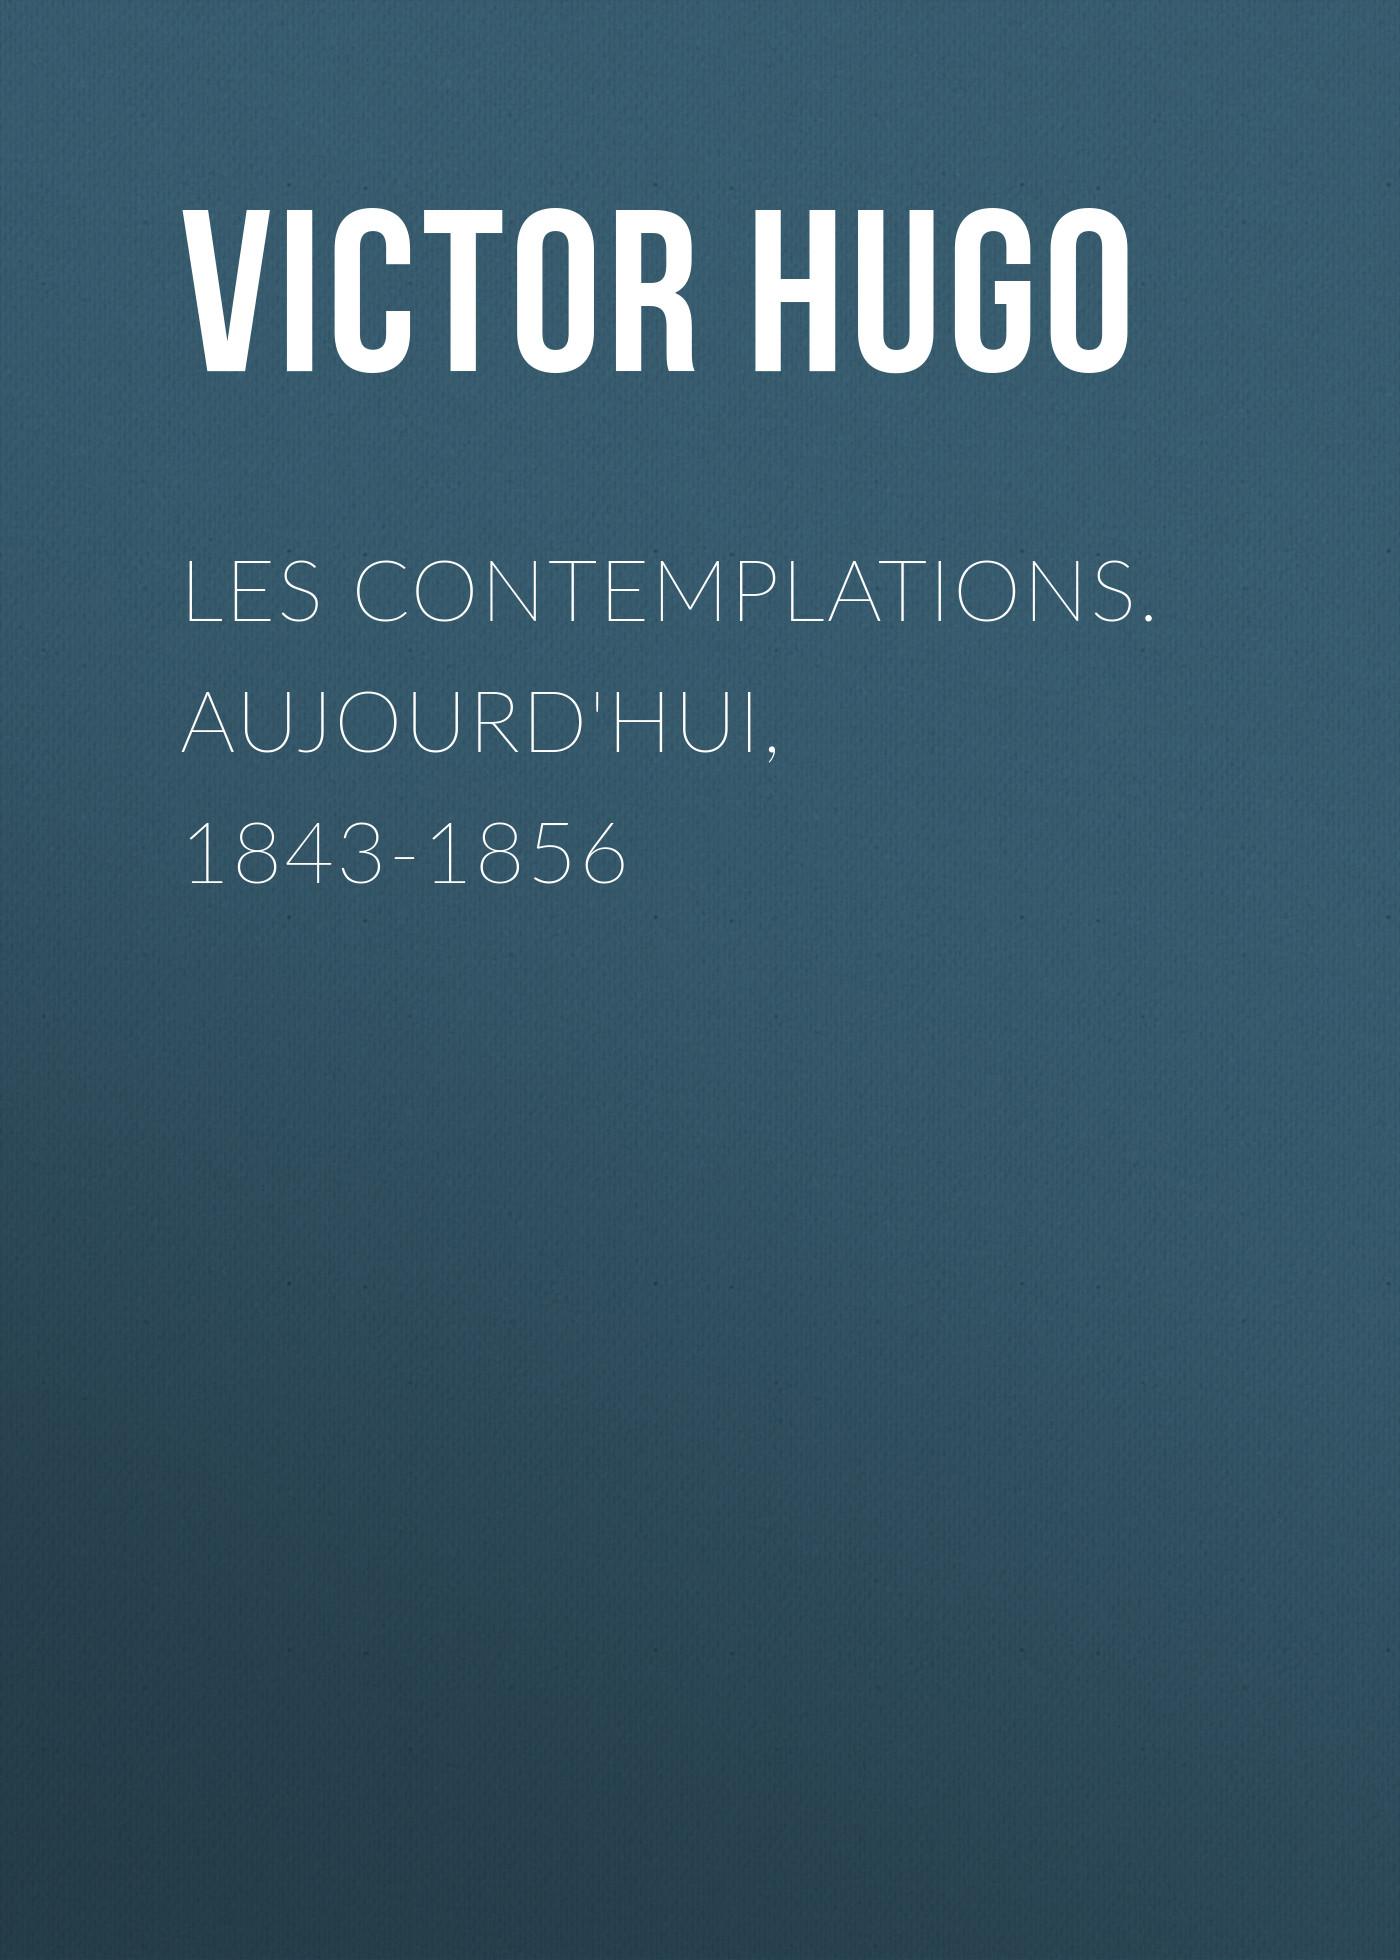 Виктор Мари Гюго Les contemplations. Aujourd'hui, 1843-1856 цена